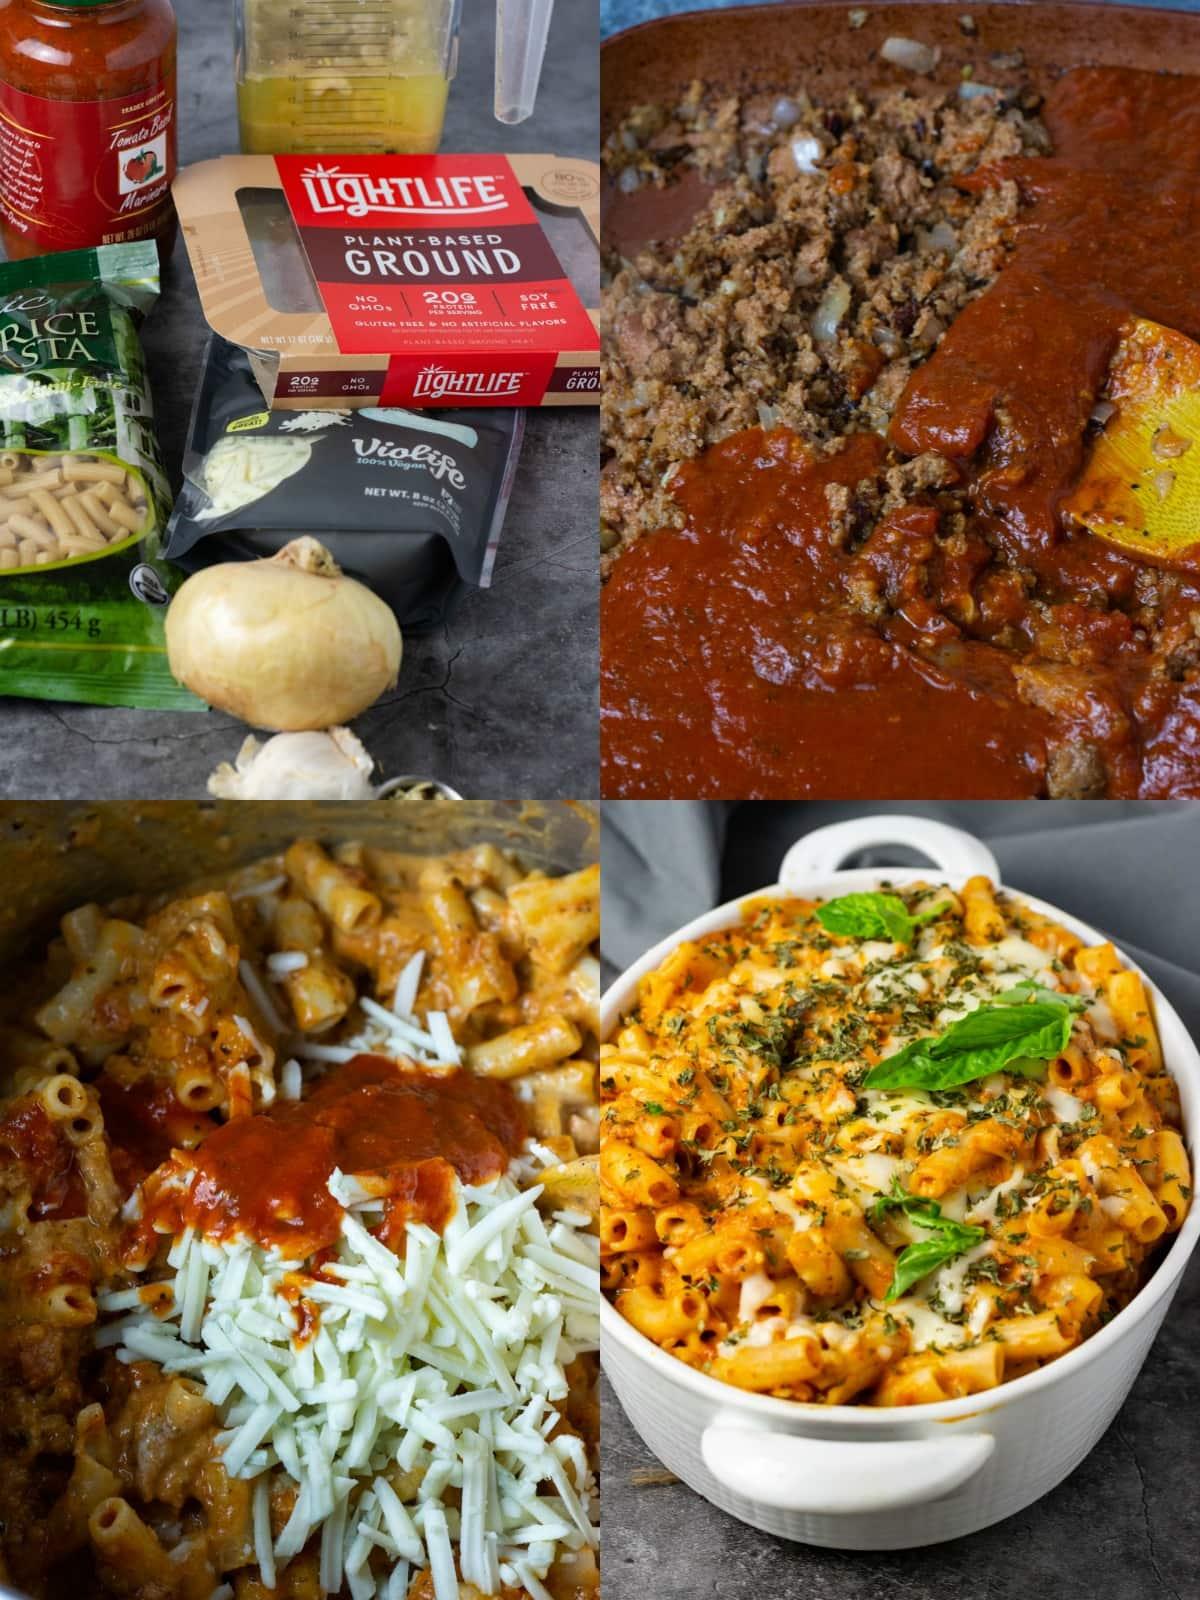 Vegan baked ziti, step by step shots